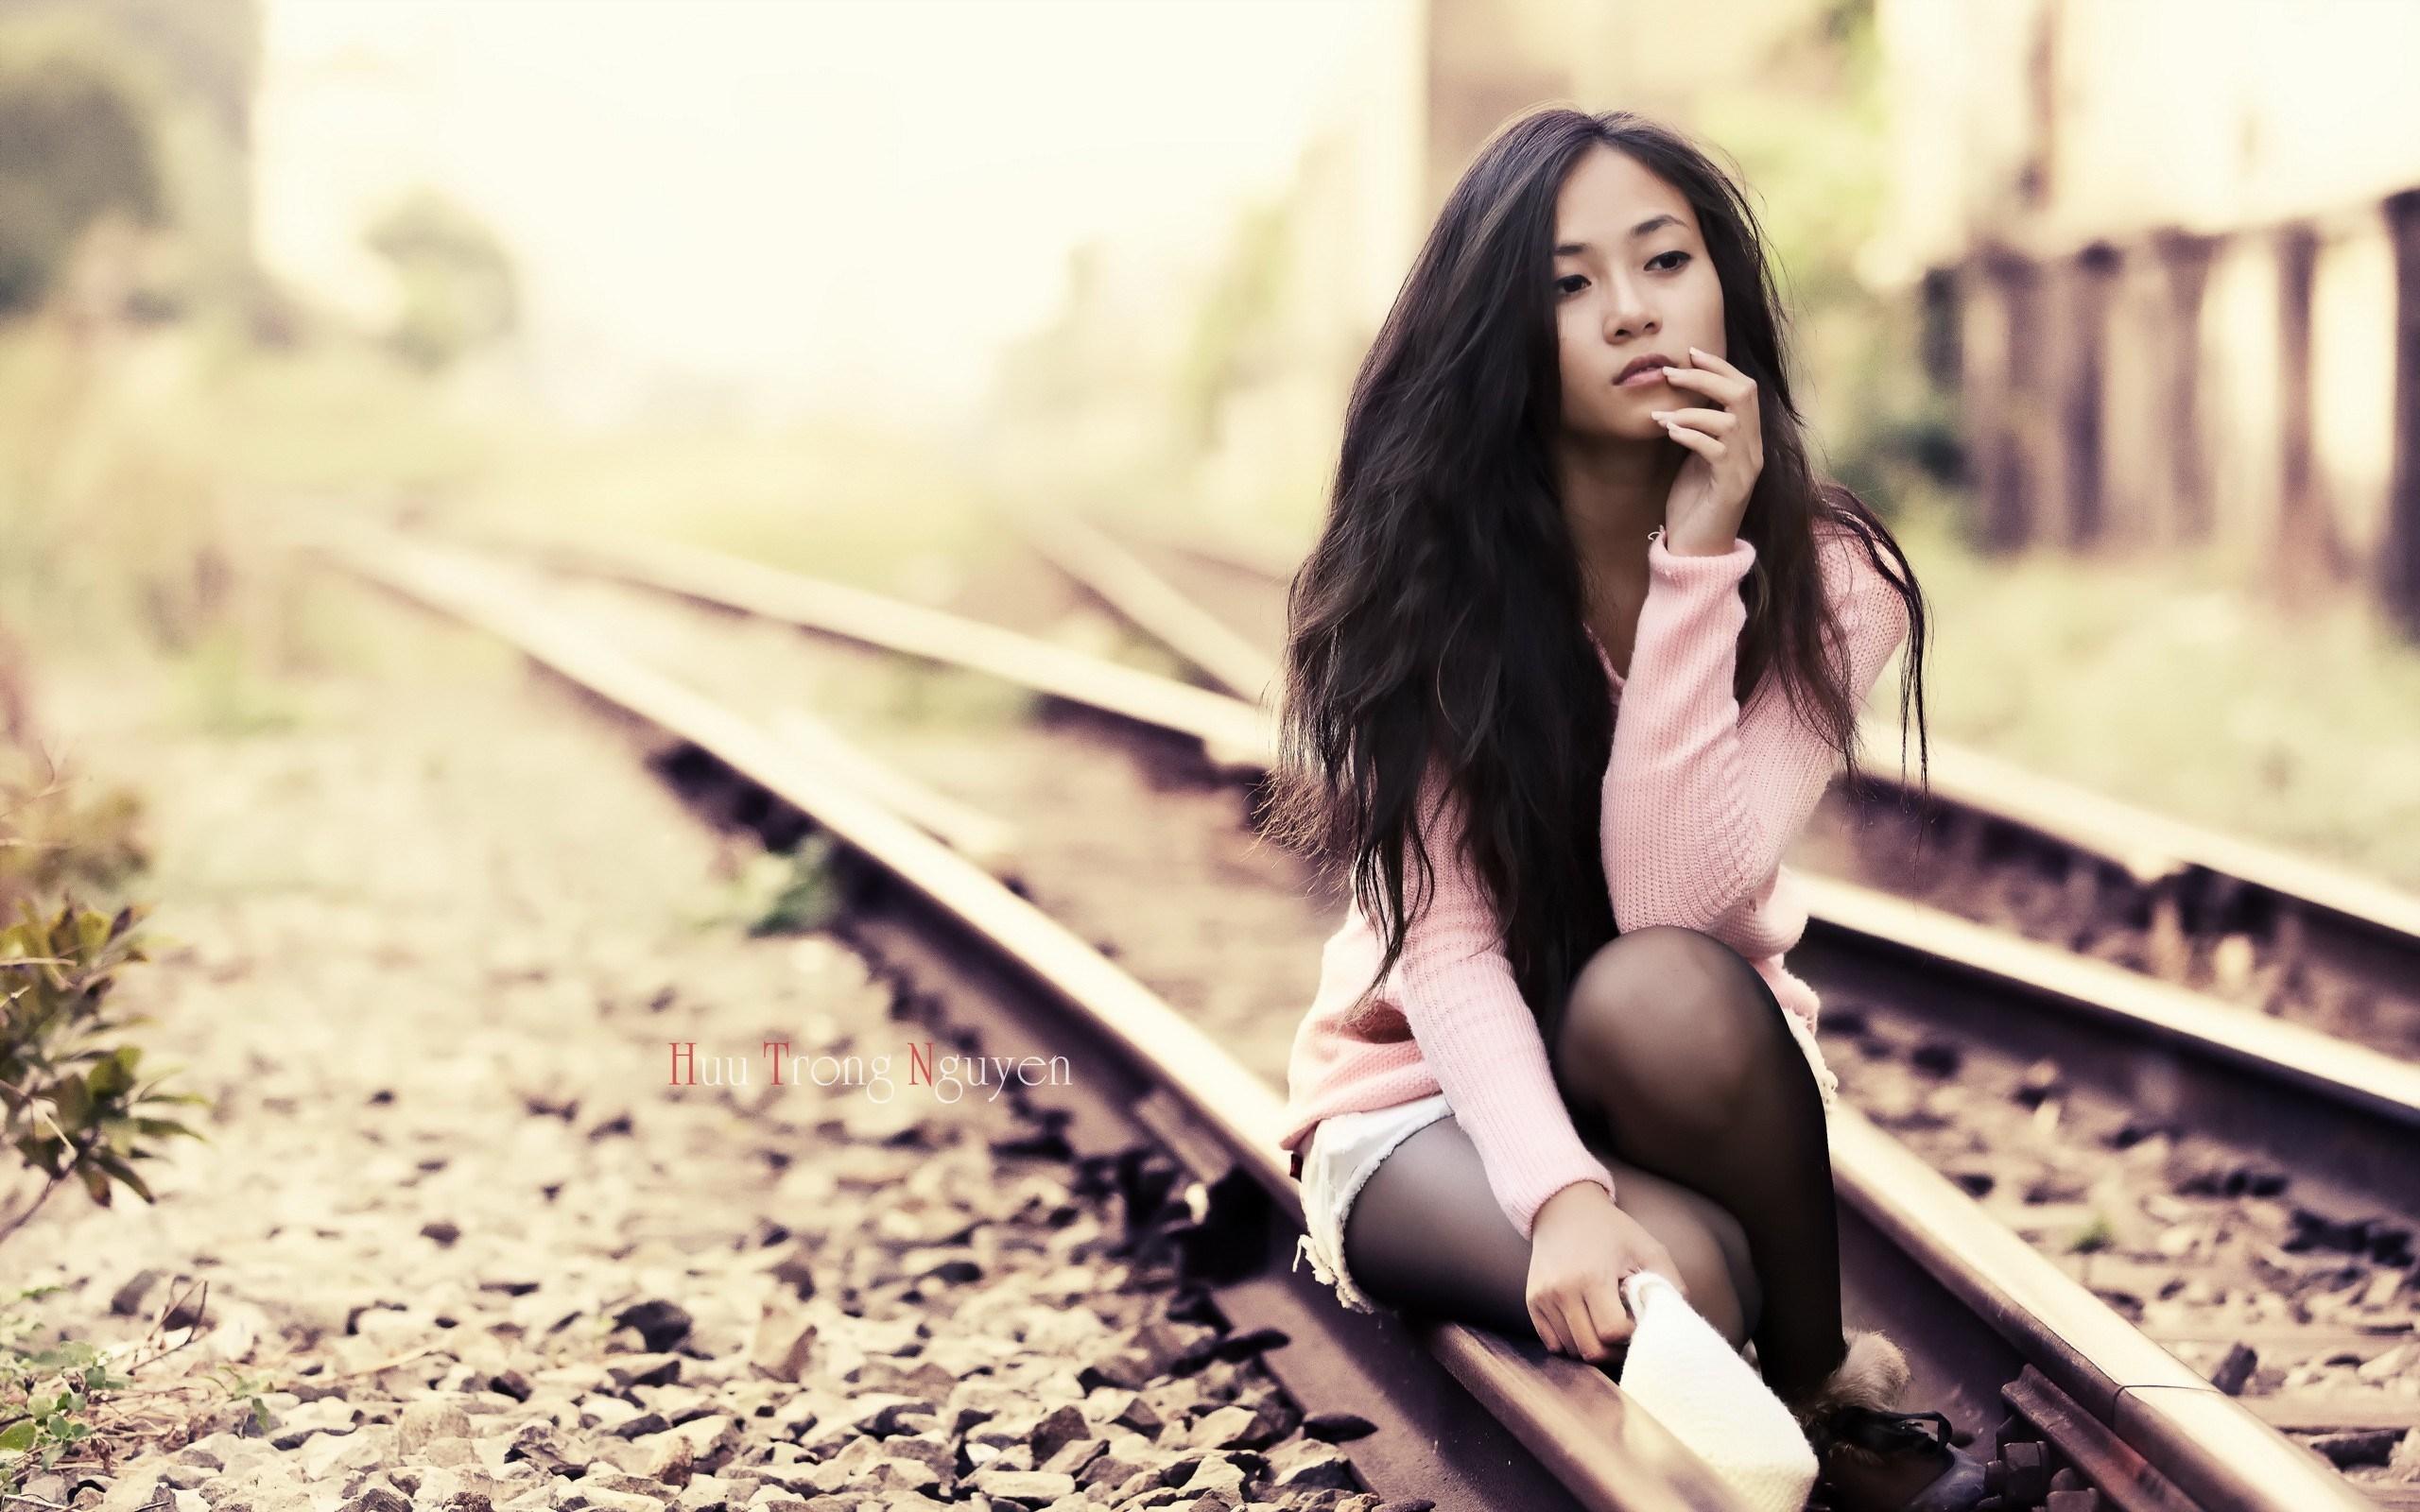 Railway Beauty Asian Girl - Girls Desktop , HD Wallpaper & Backgrounds